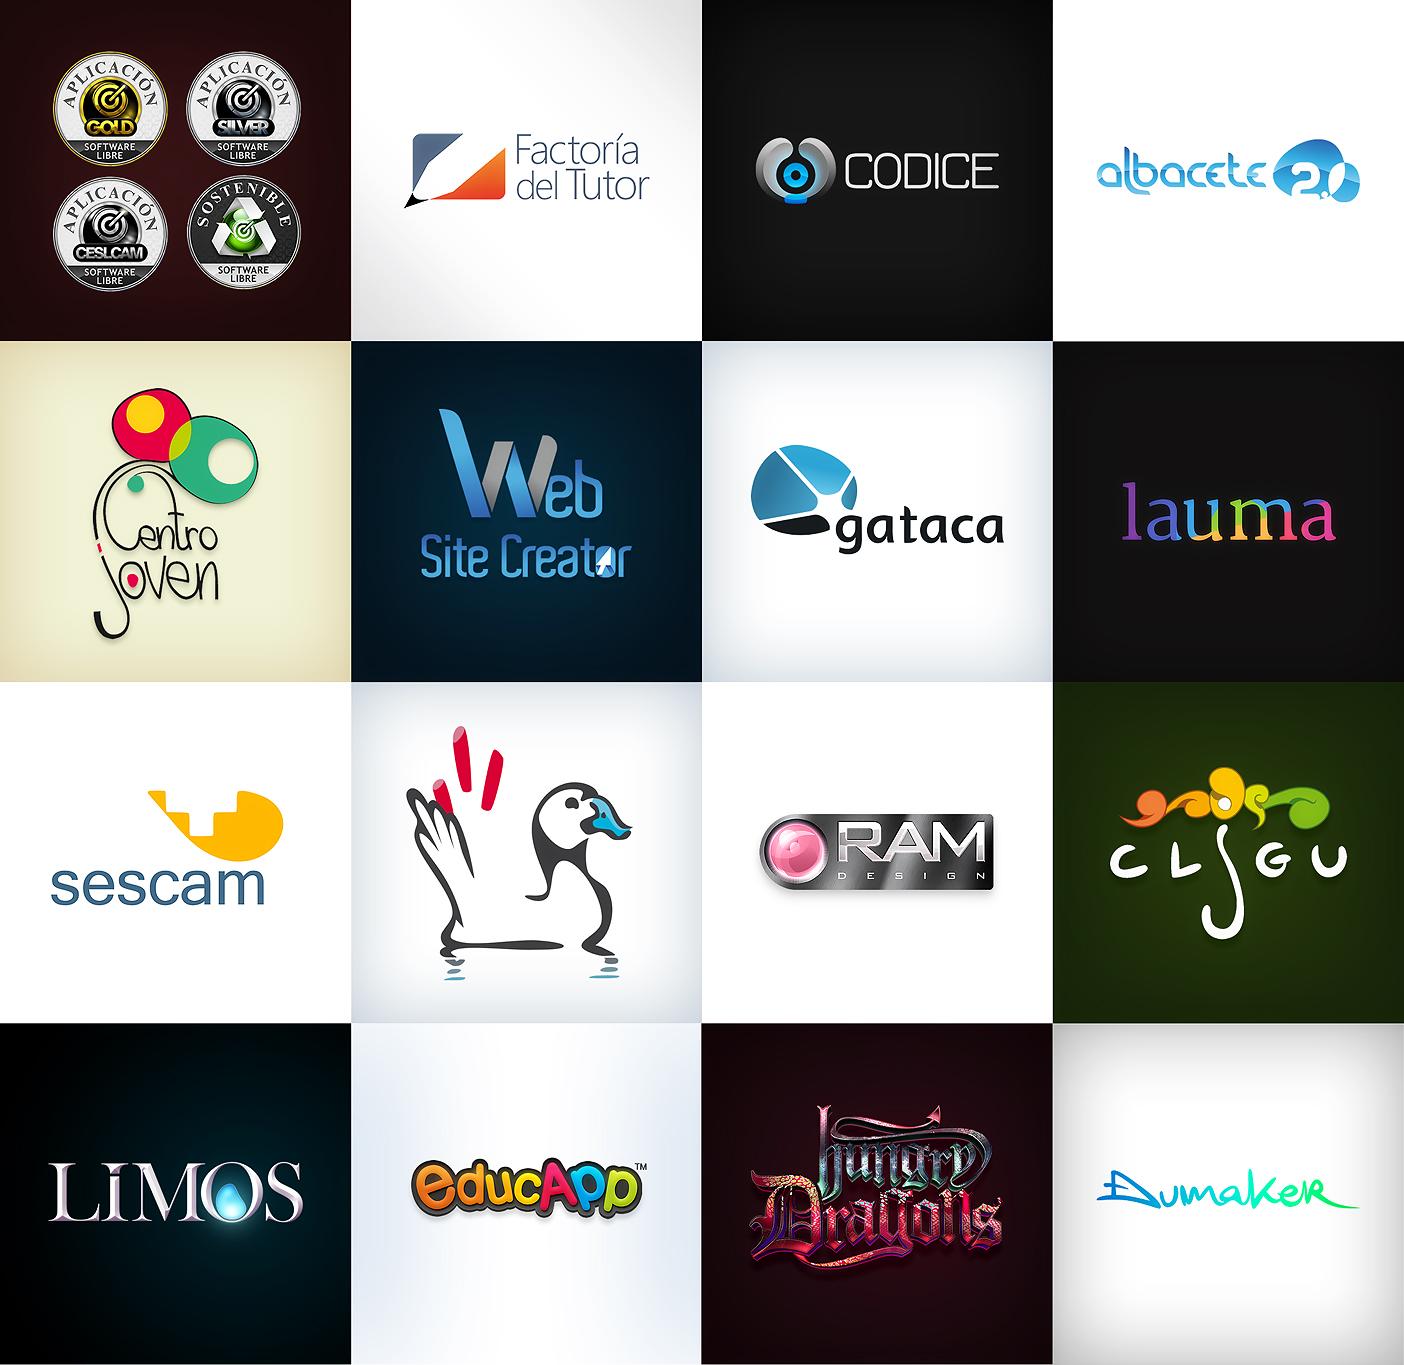 Dumaker Logos Collection